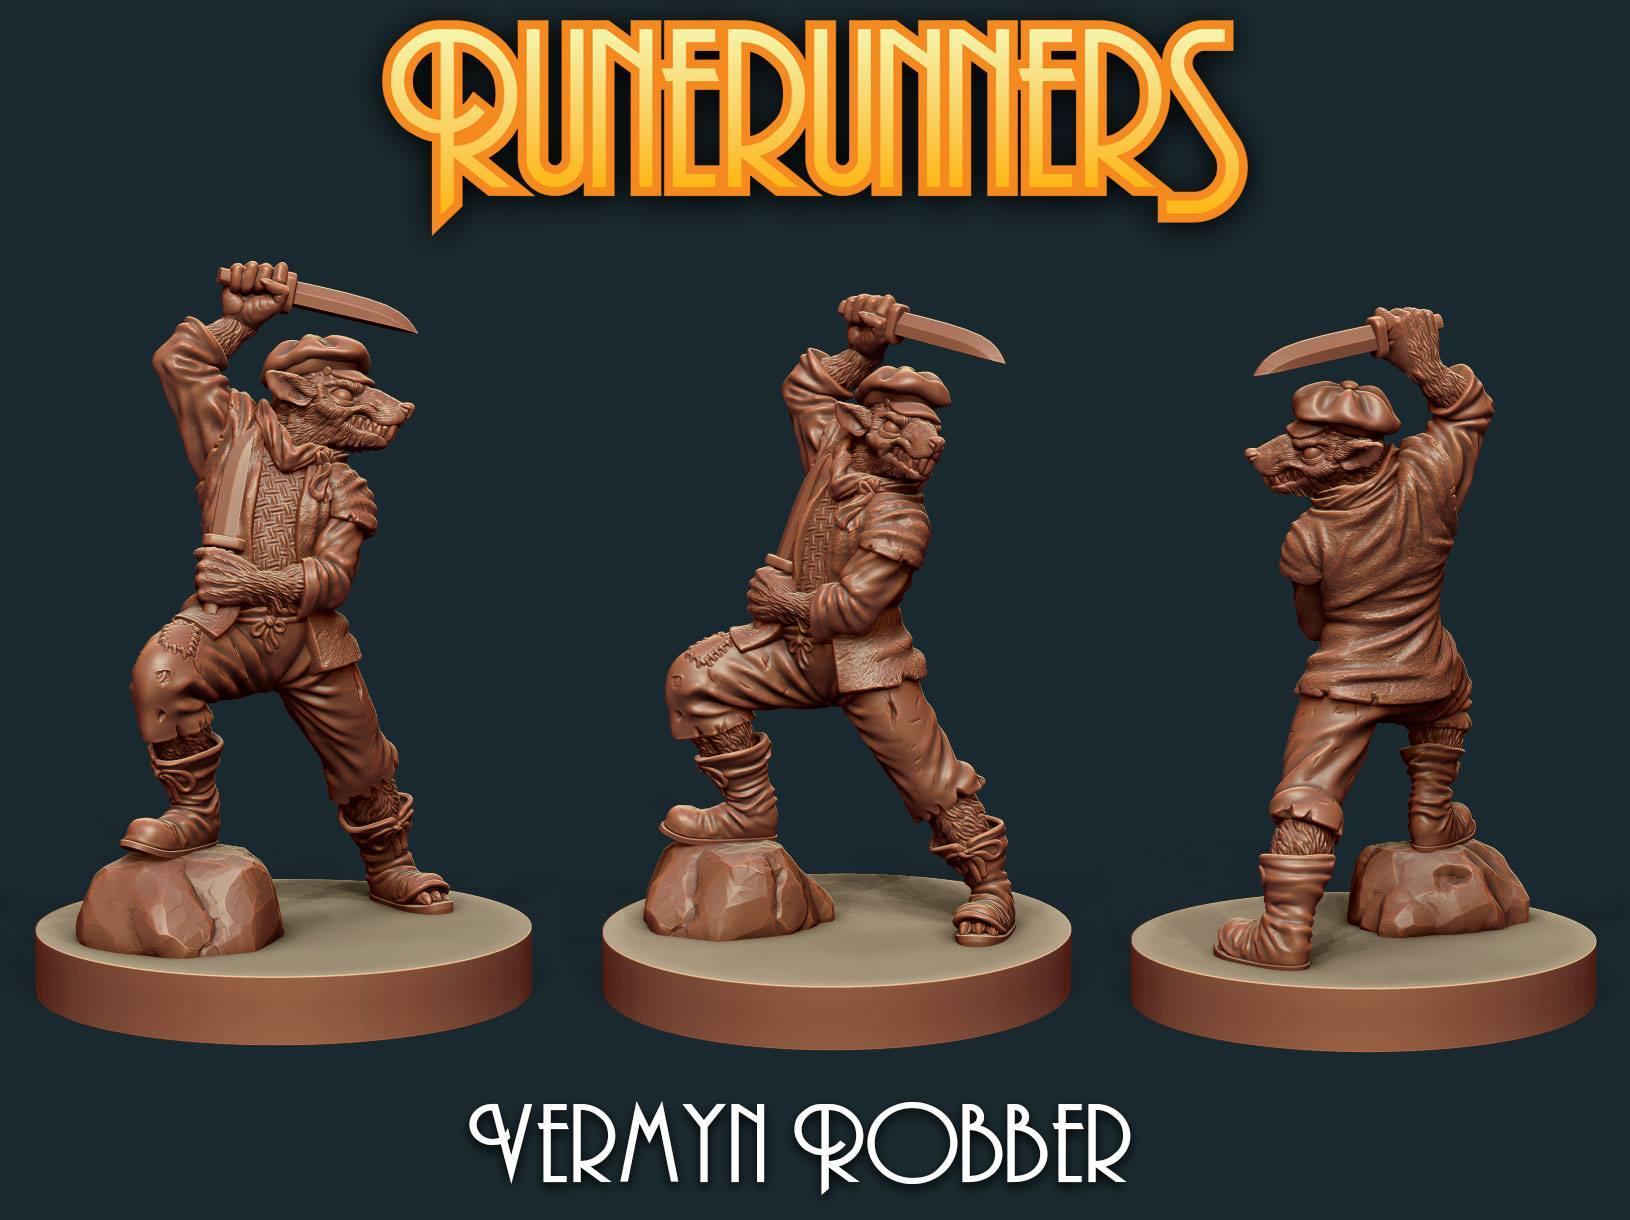 Runerunners Vermyn Robber